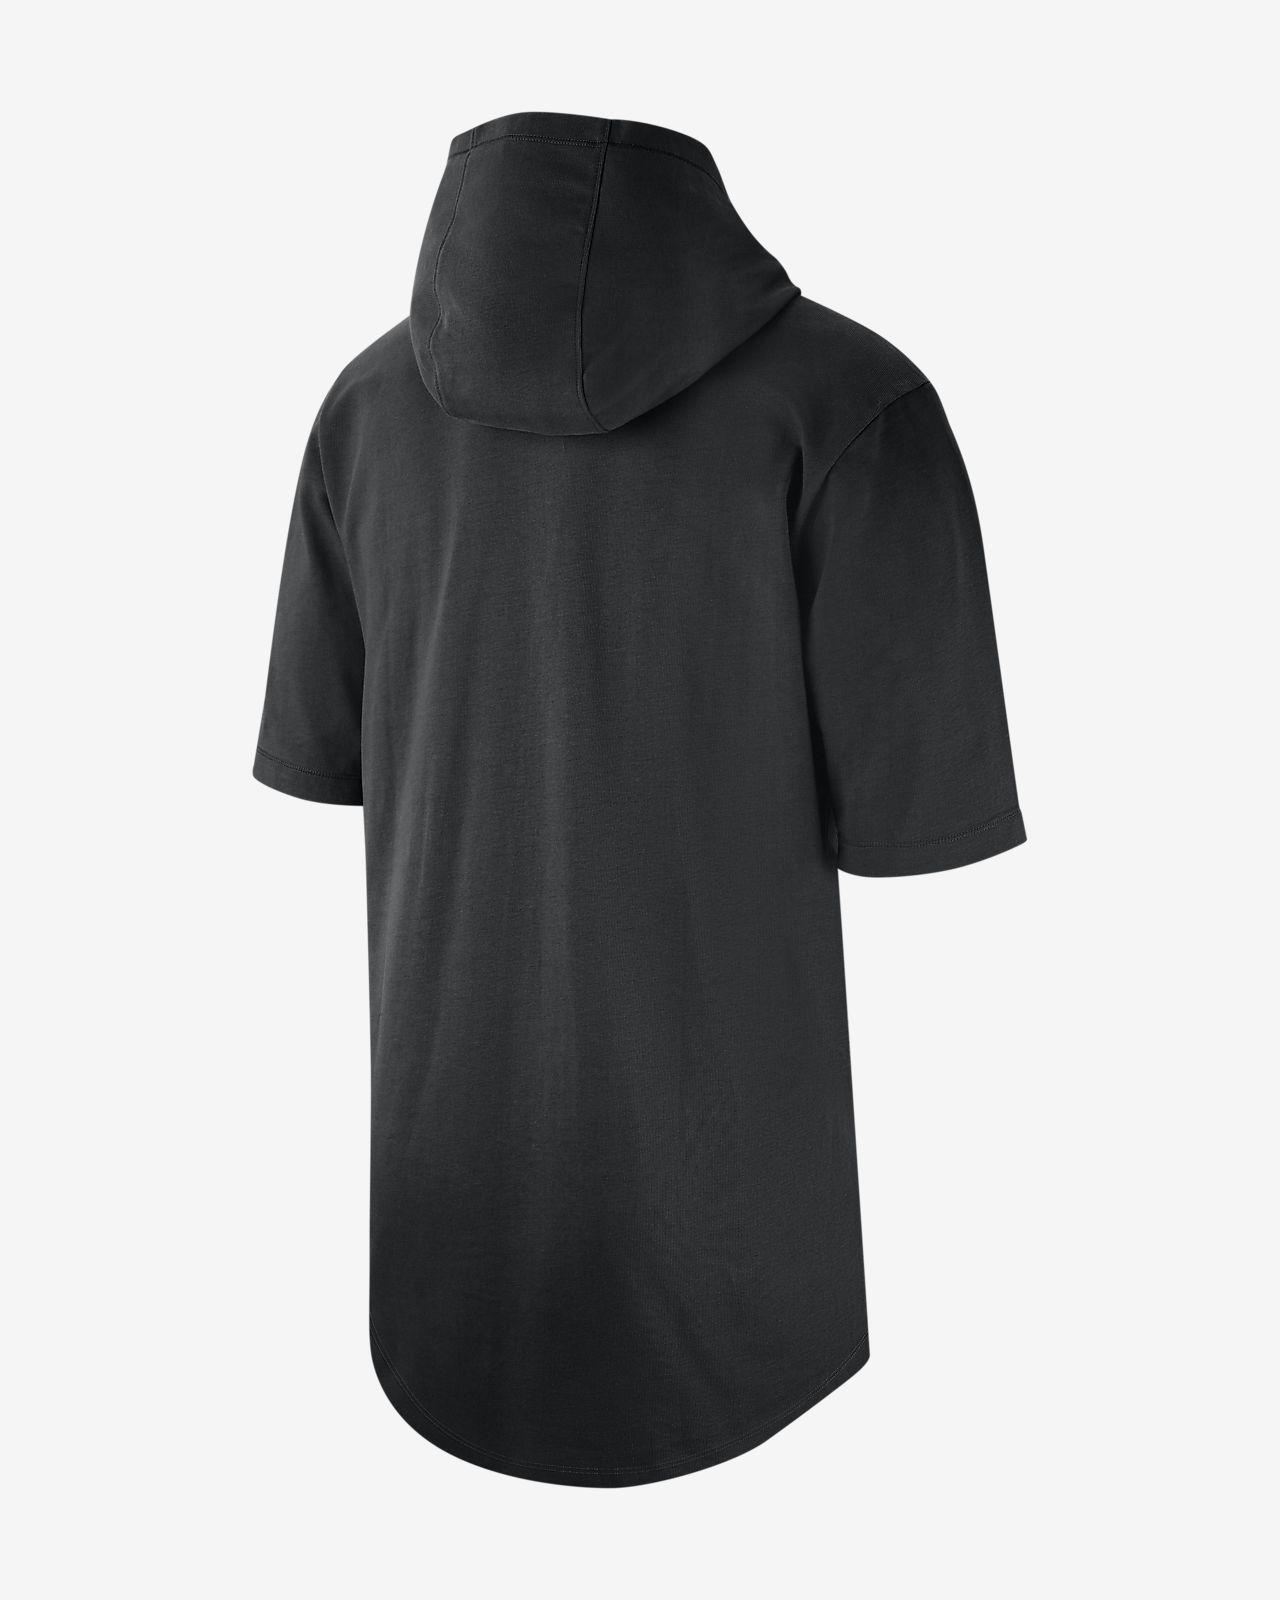 best choice biggest discount half off Golden State Warriors Nike Men's NBA Hooded T-Shirt